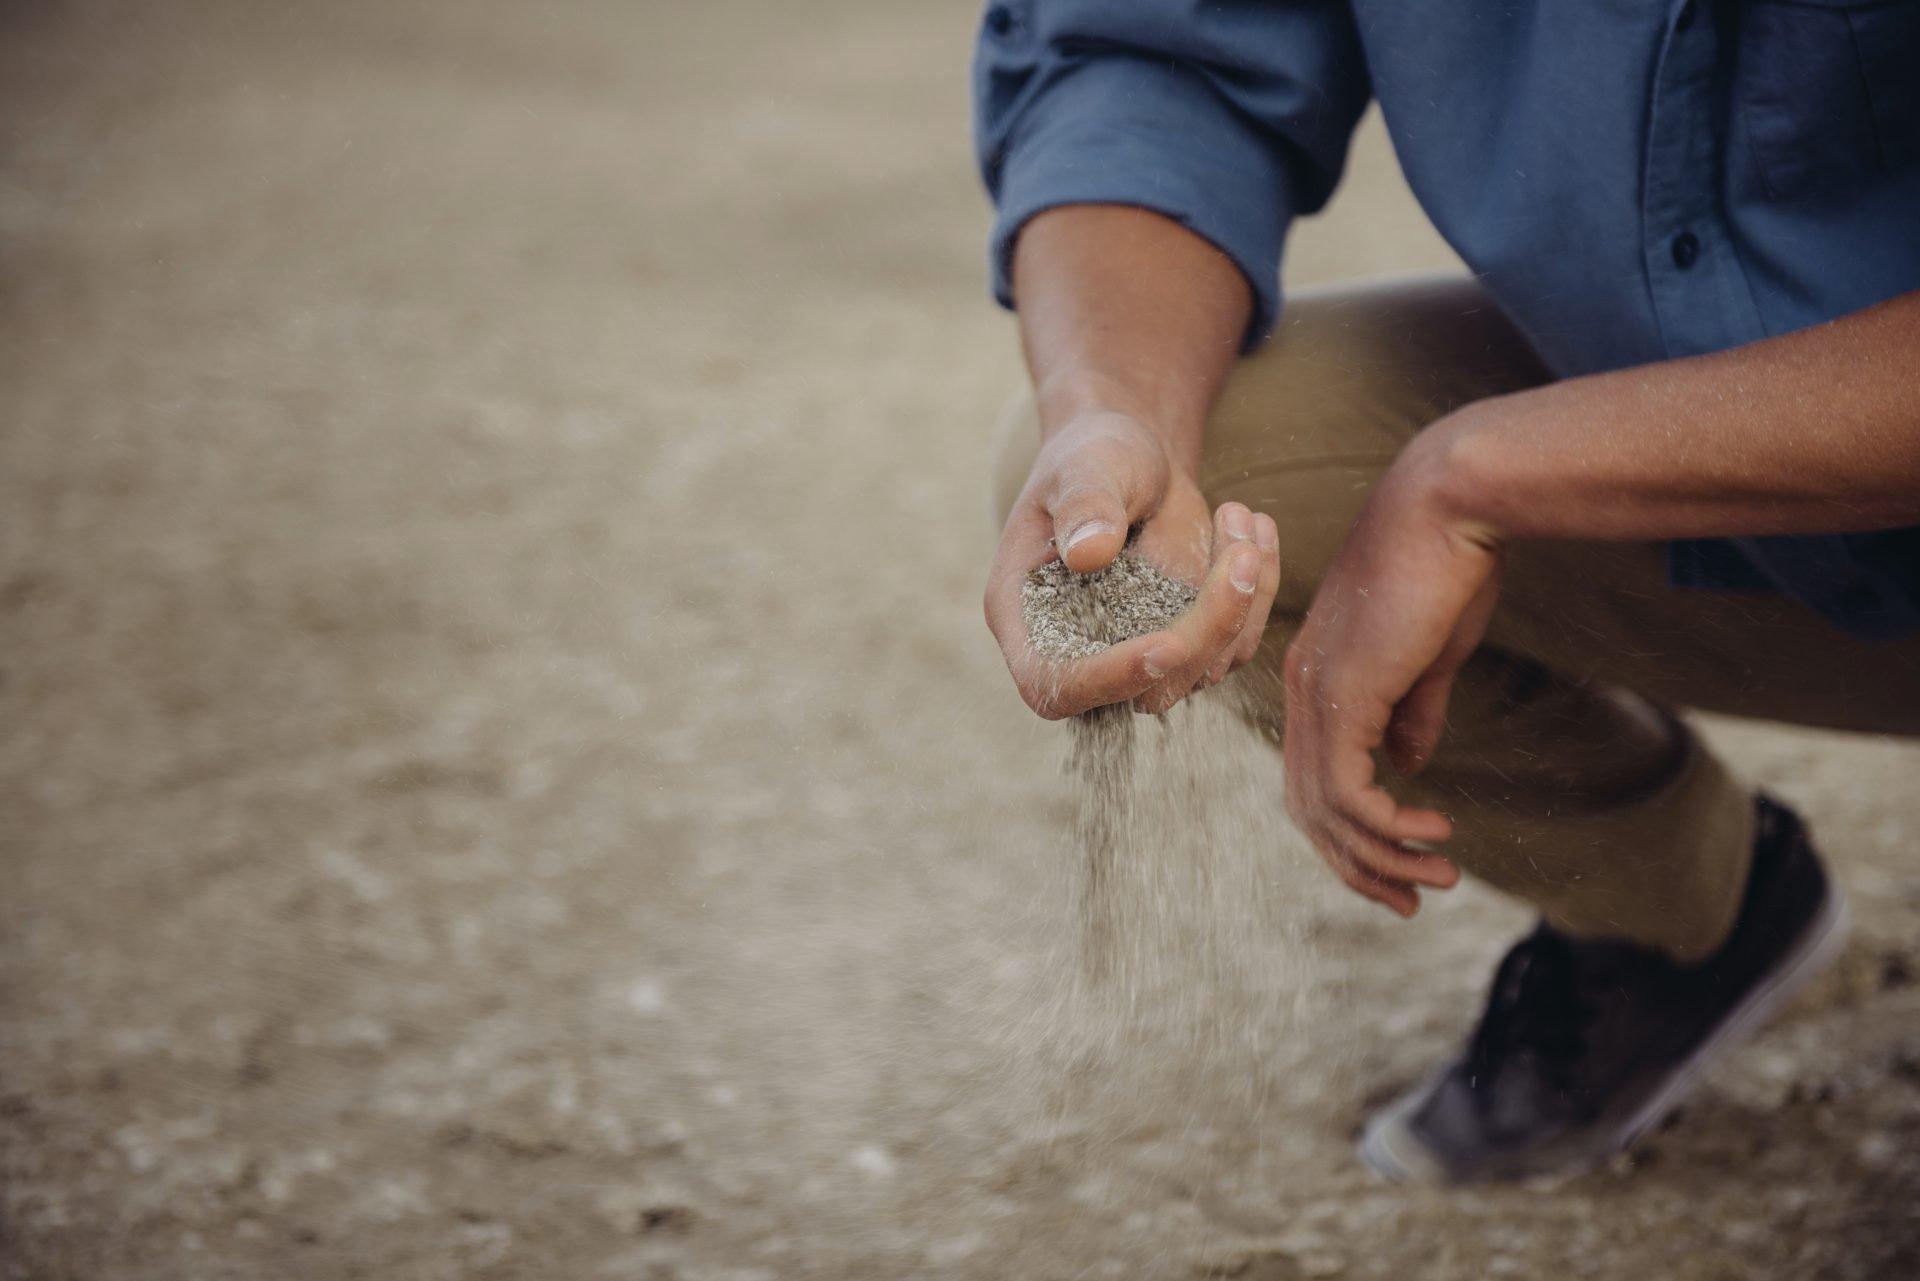 Análise ao solo